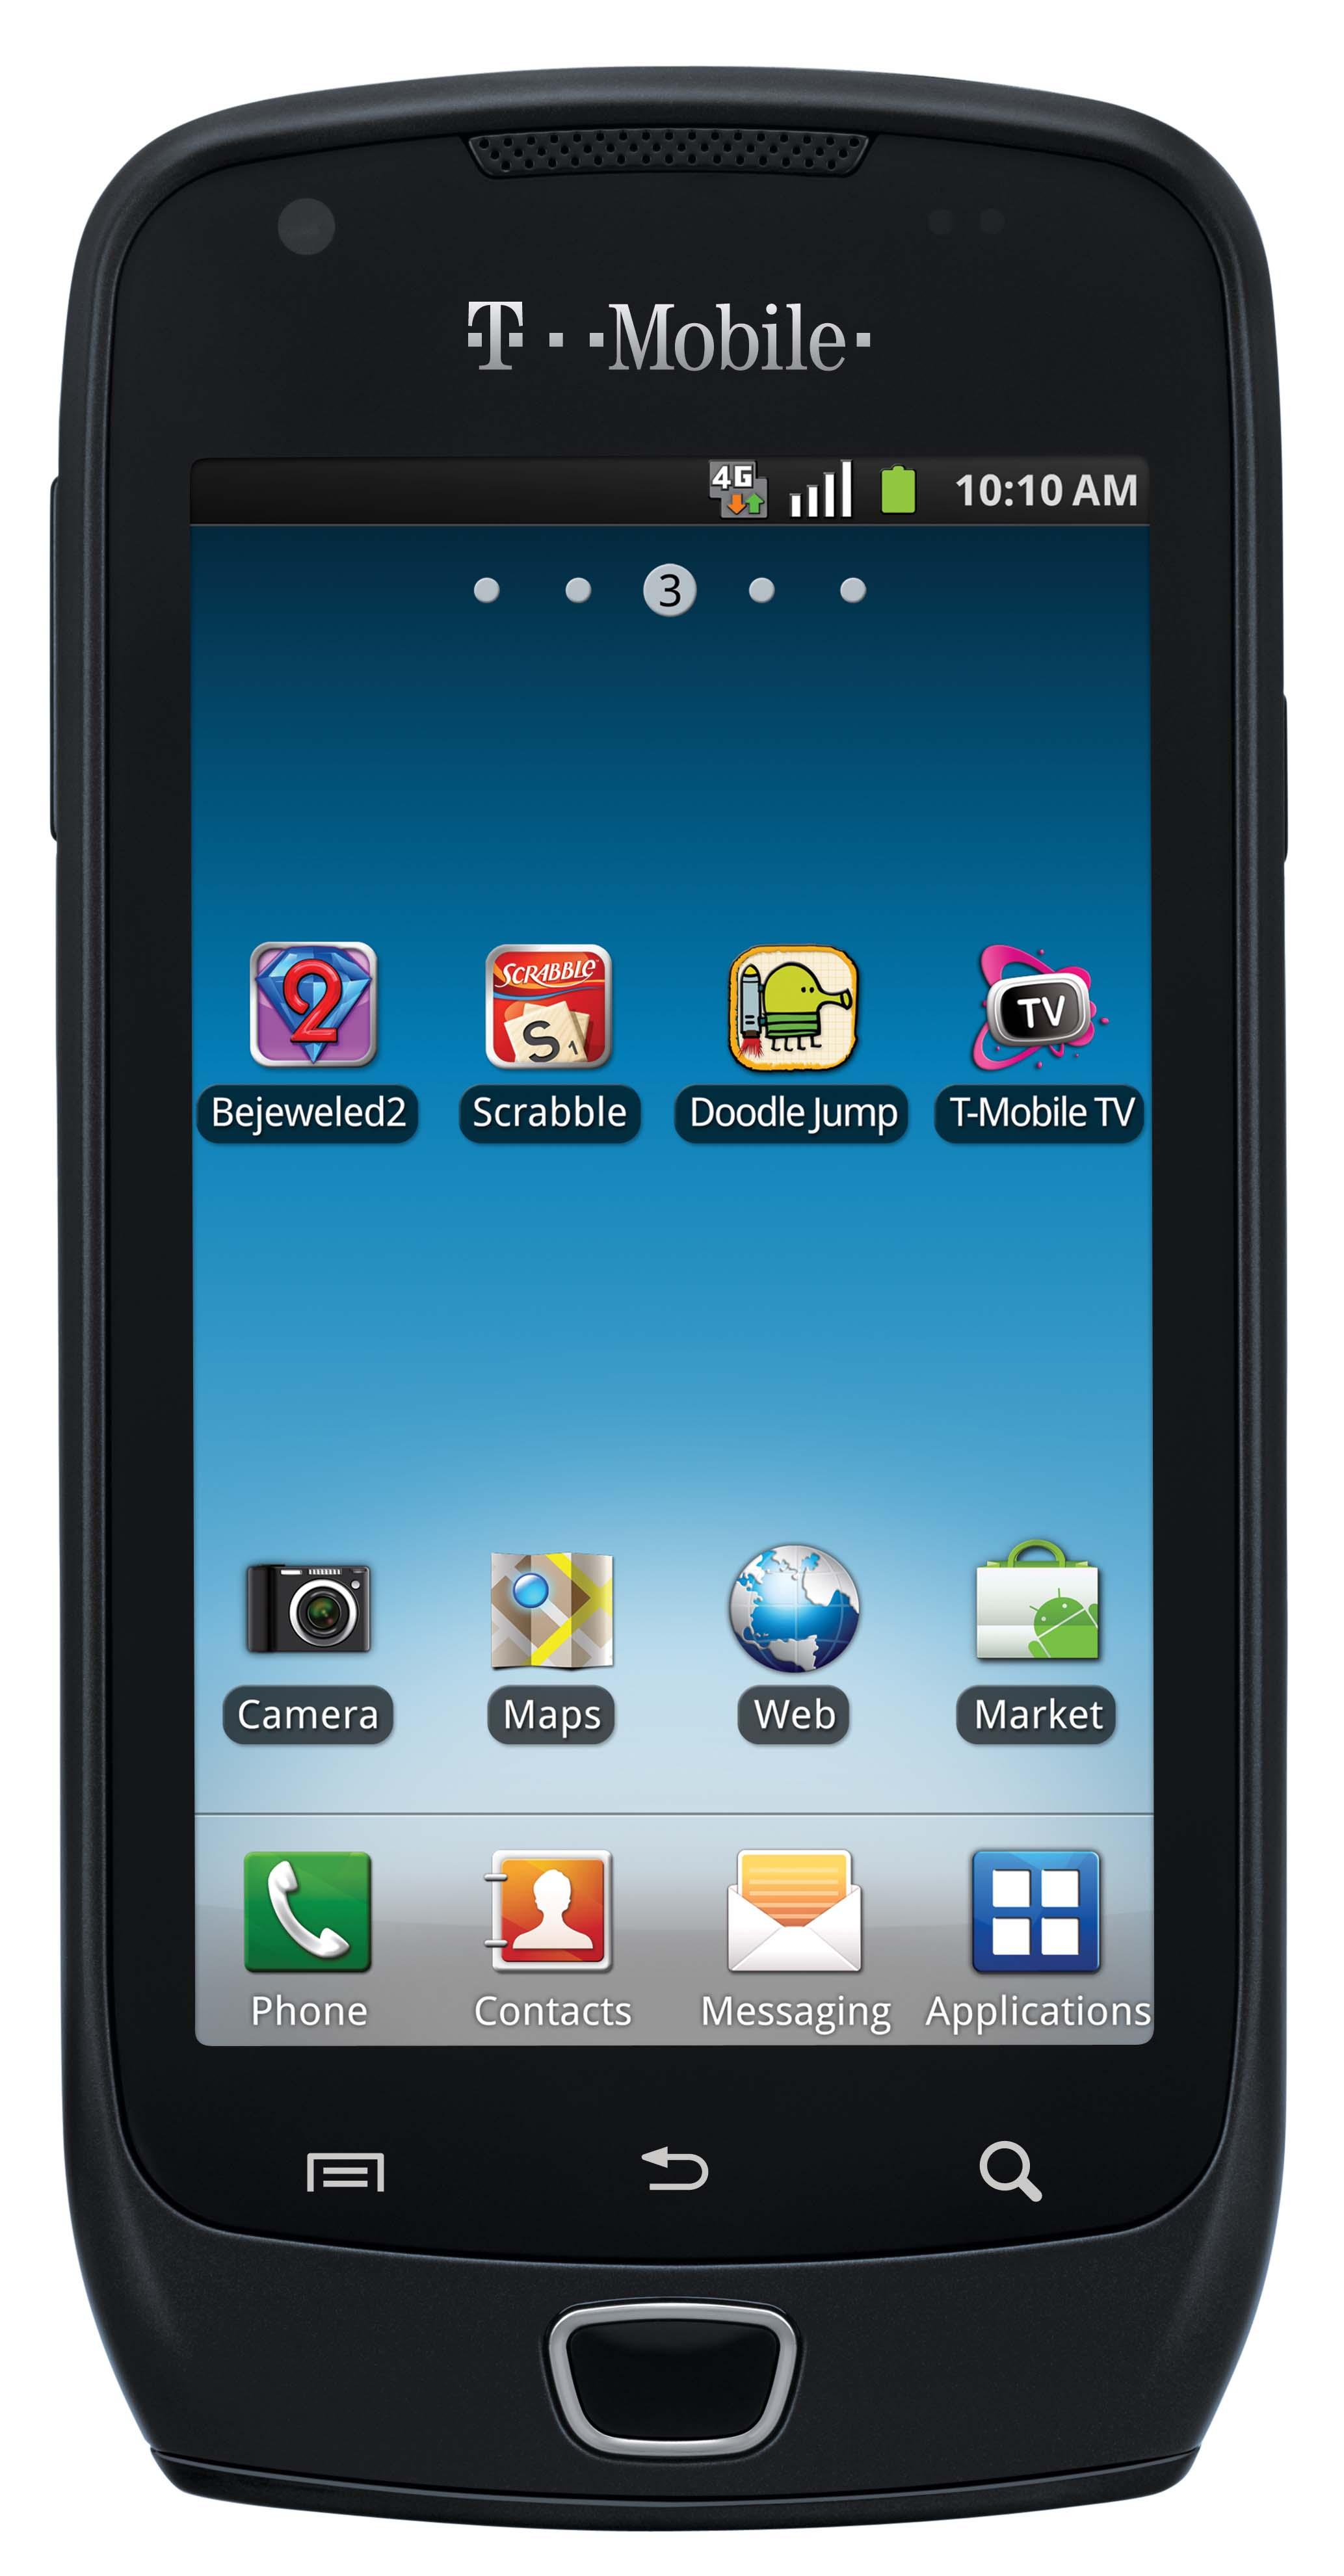 Samsung Exhibit 4G and Gravity Smart Launching June 22nd?